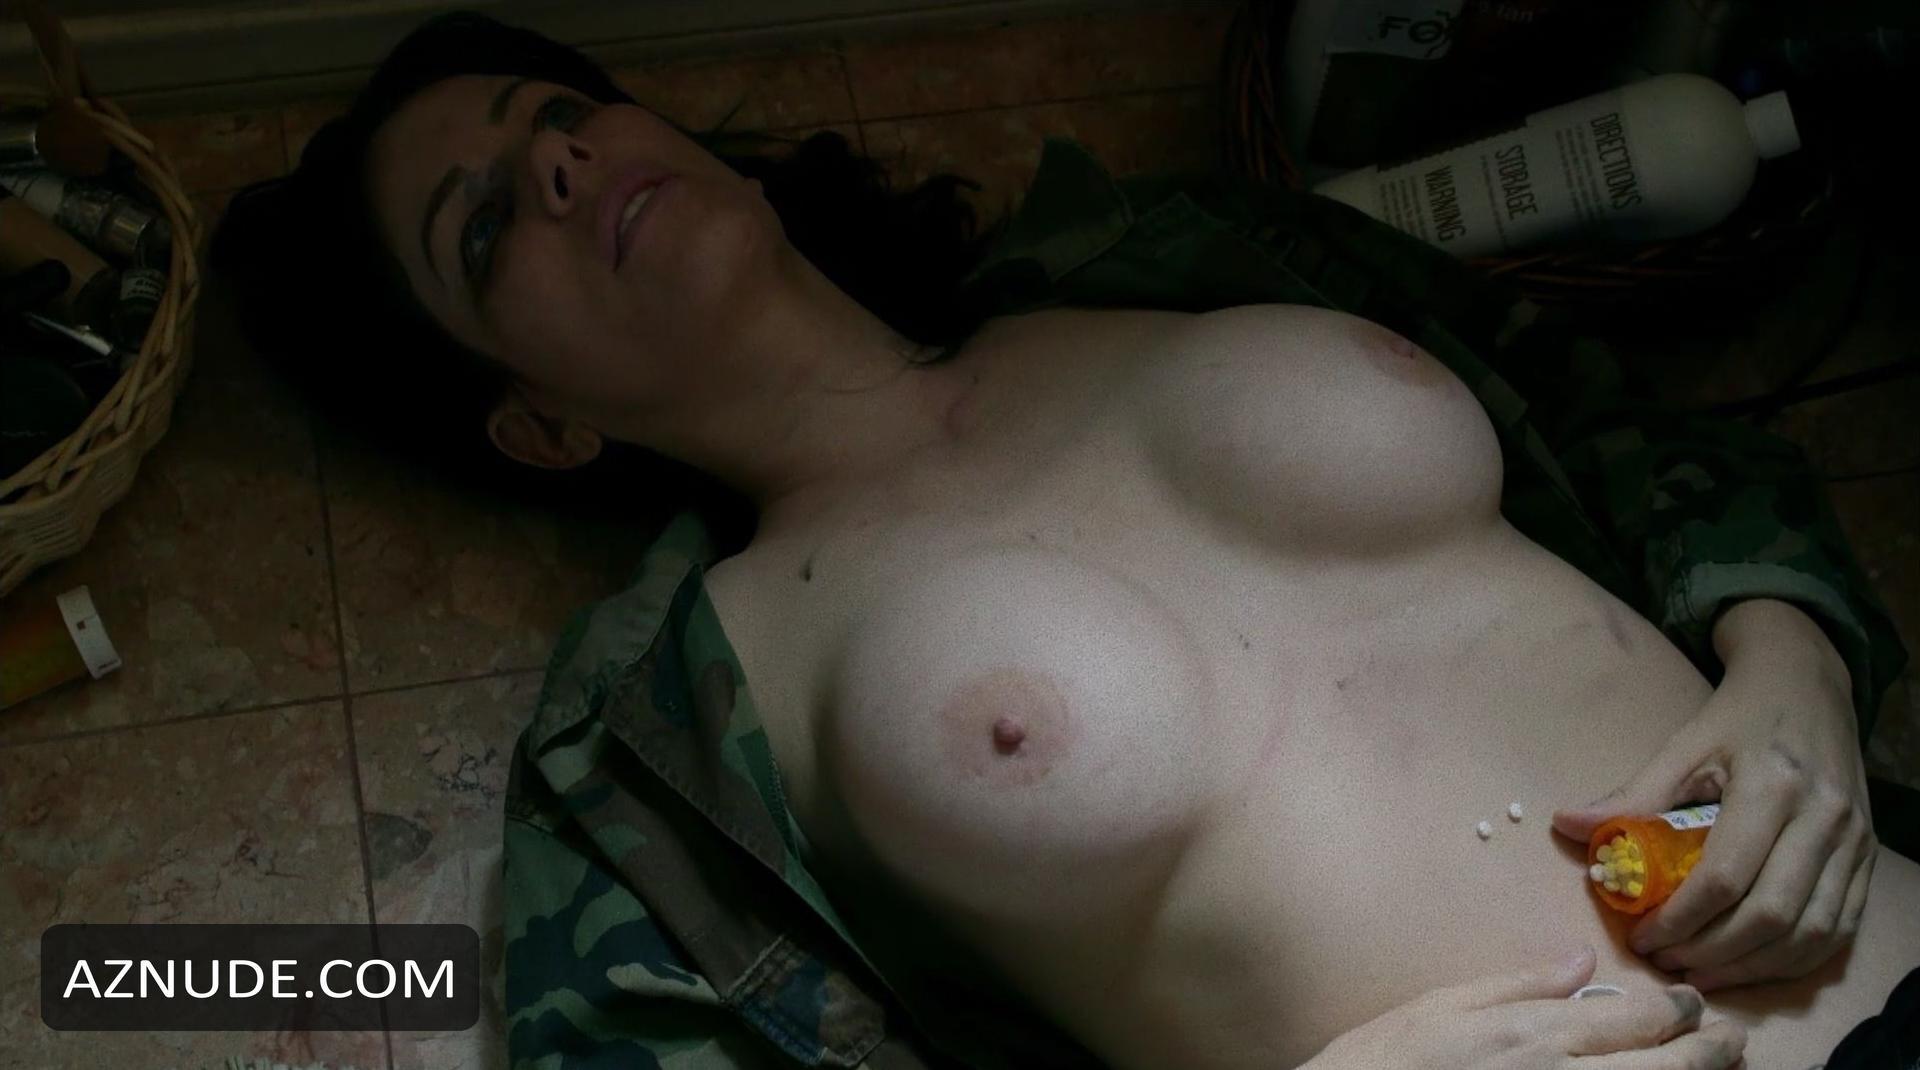 Amber Dawn Nude amber dawn lee nude aznude gallery-4264   my hotz pic